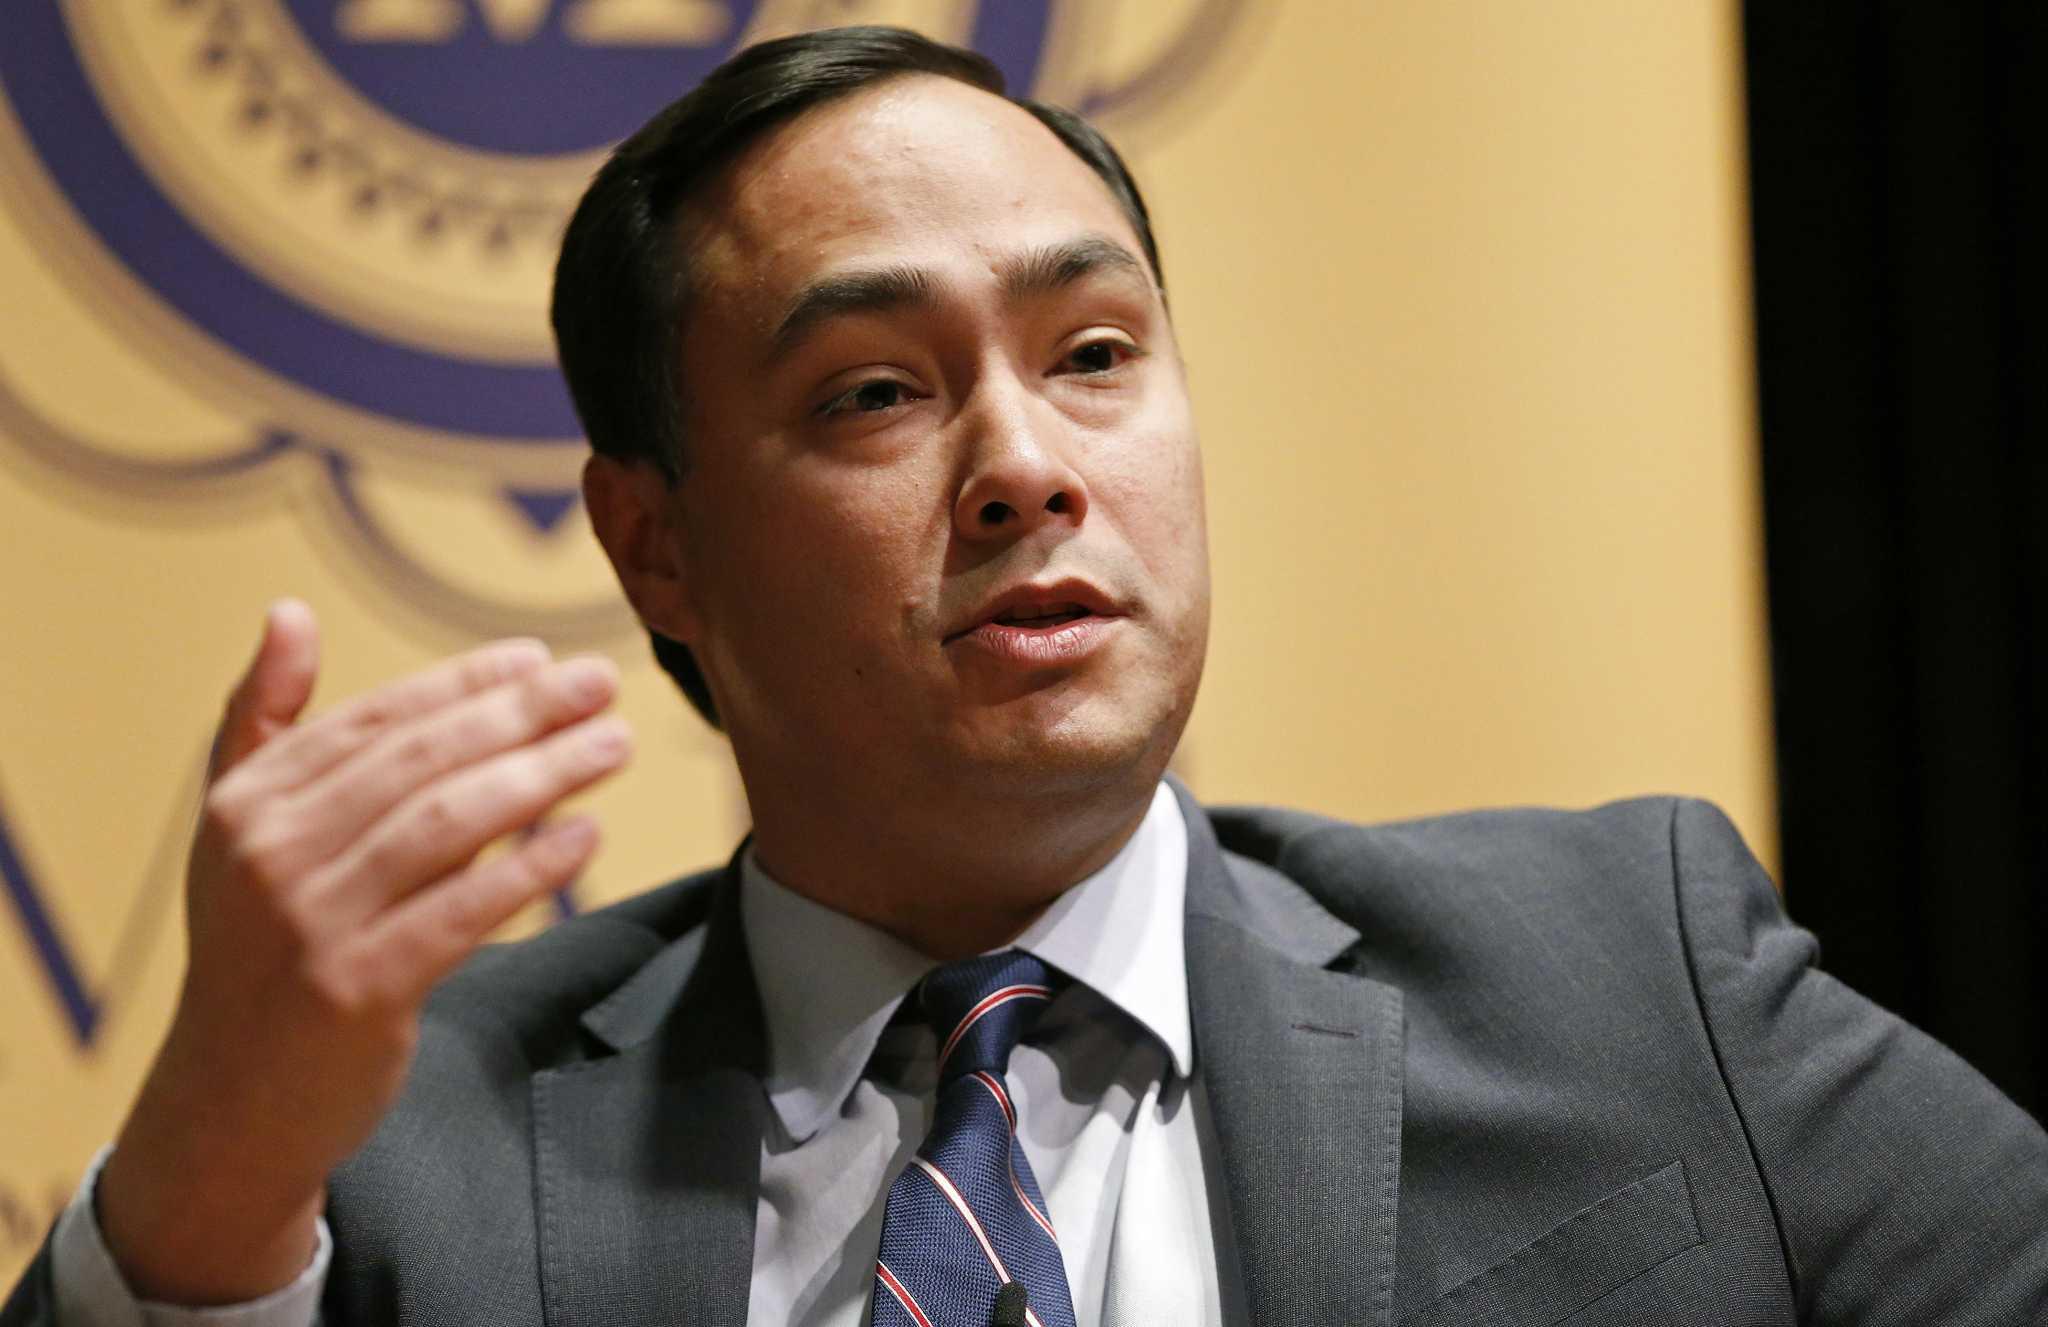 Rep Joaquin Castro To Meet With Officials Regarding